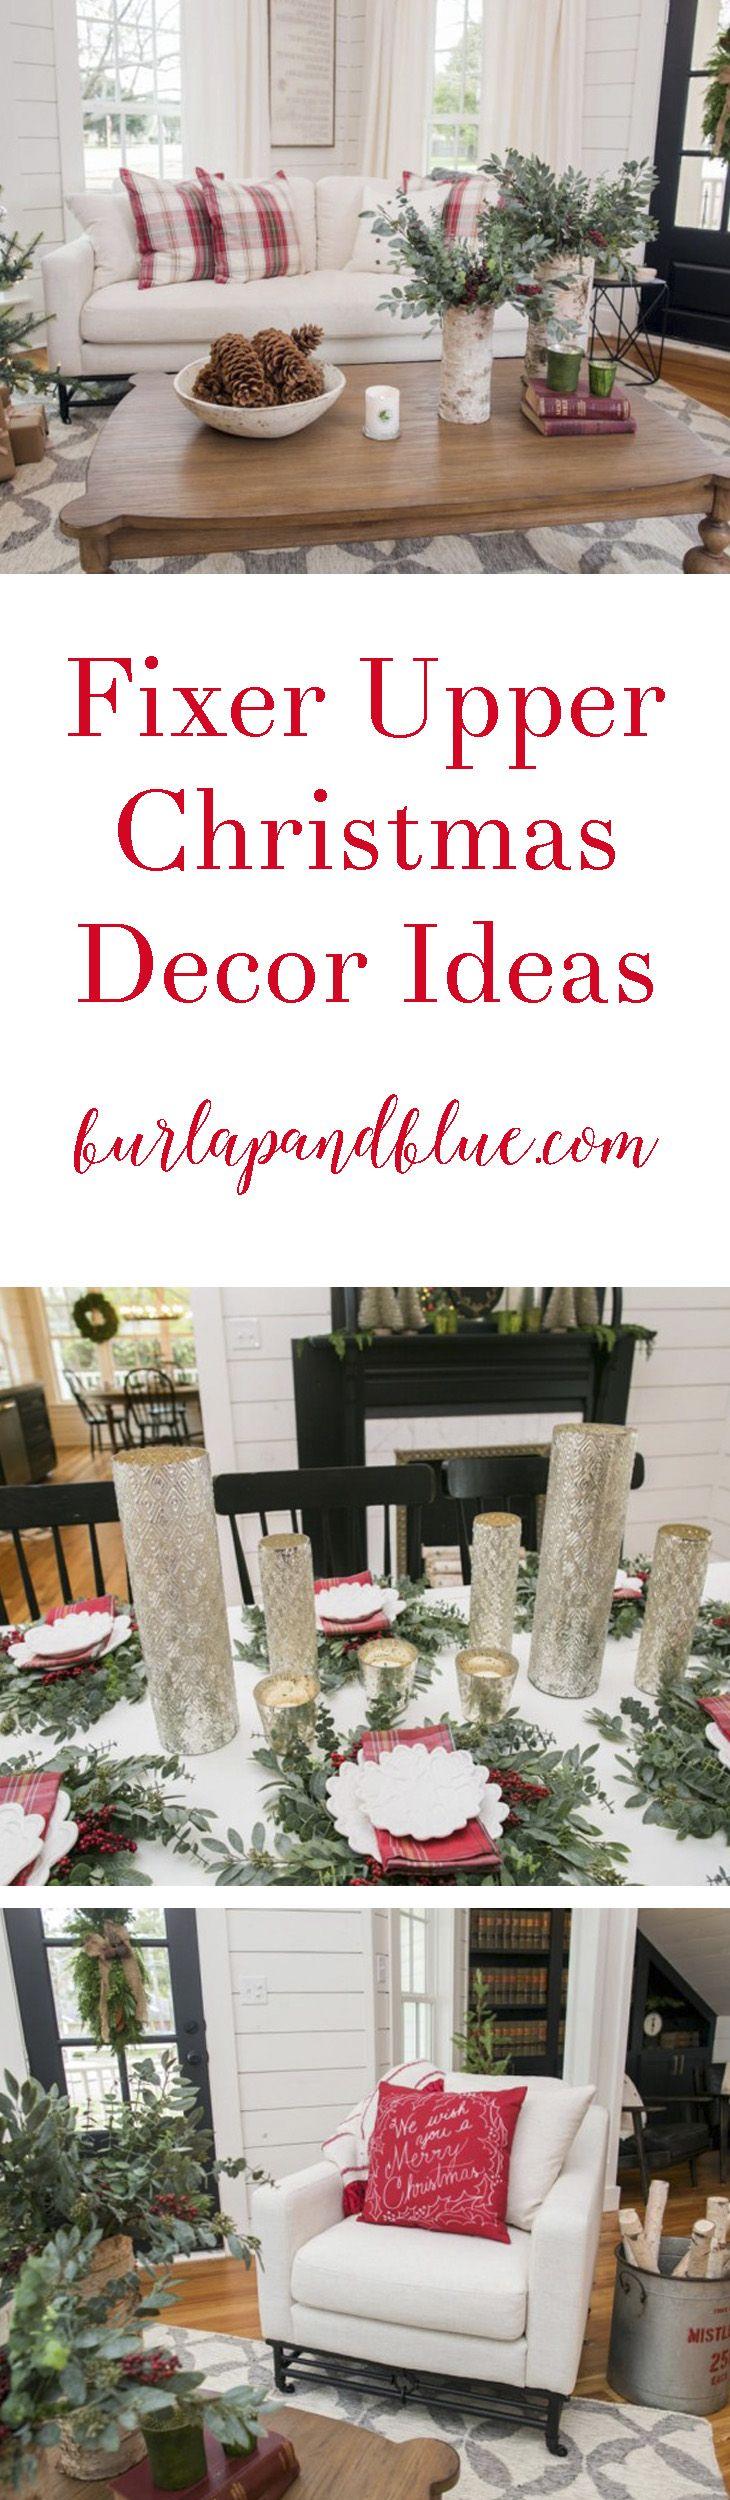 Fixer upper christmas decor inspiration holidays - Fixer upper deko ...